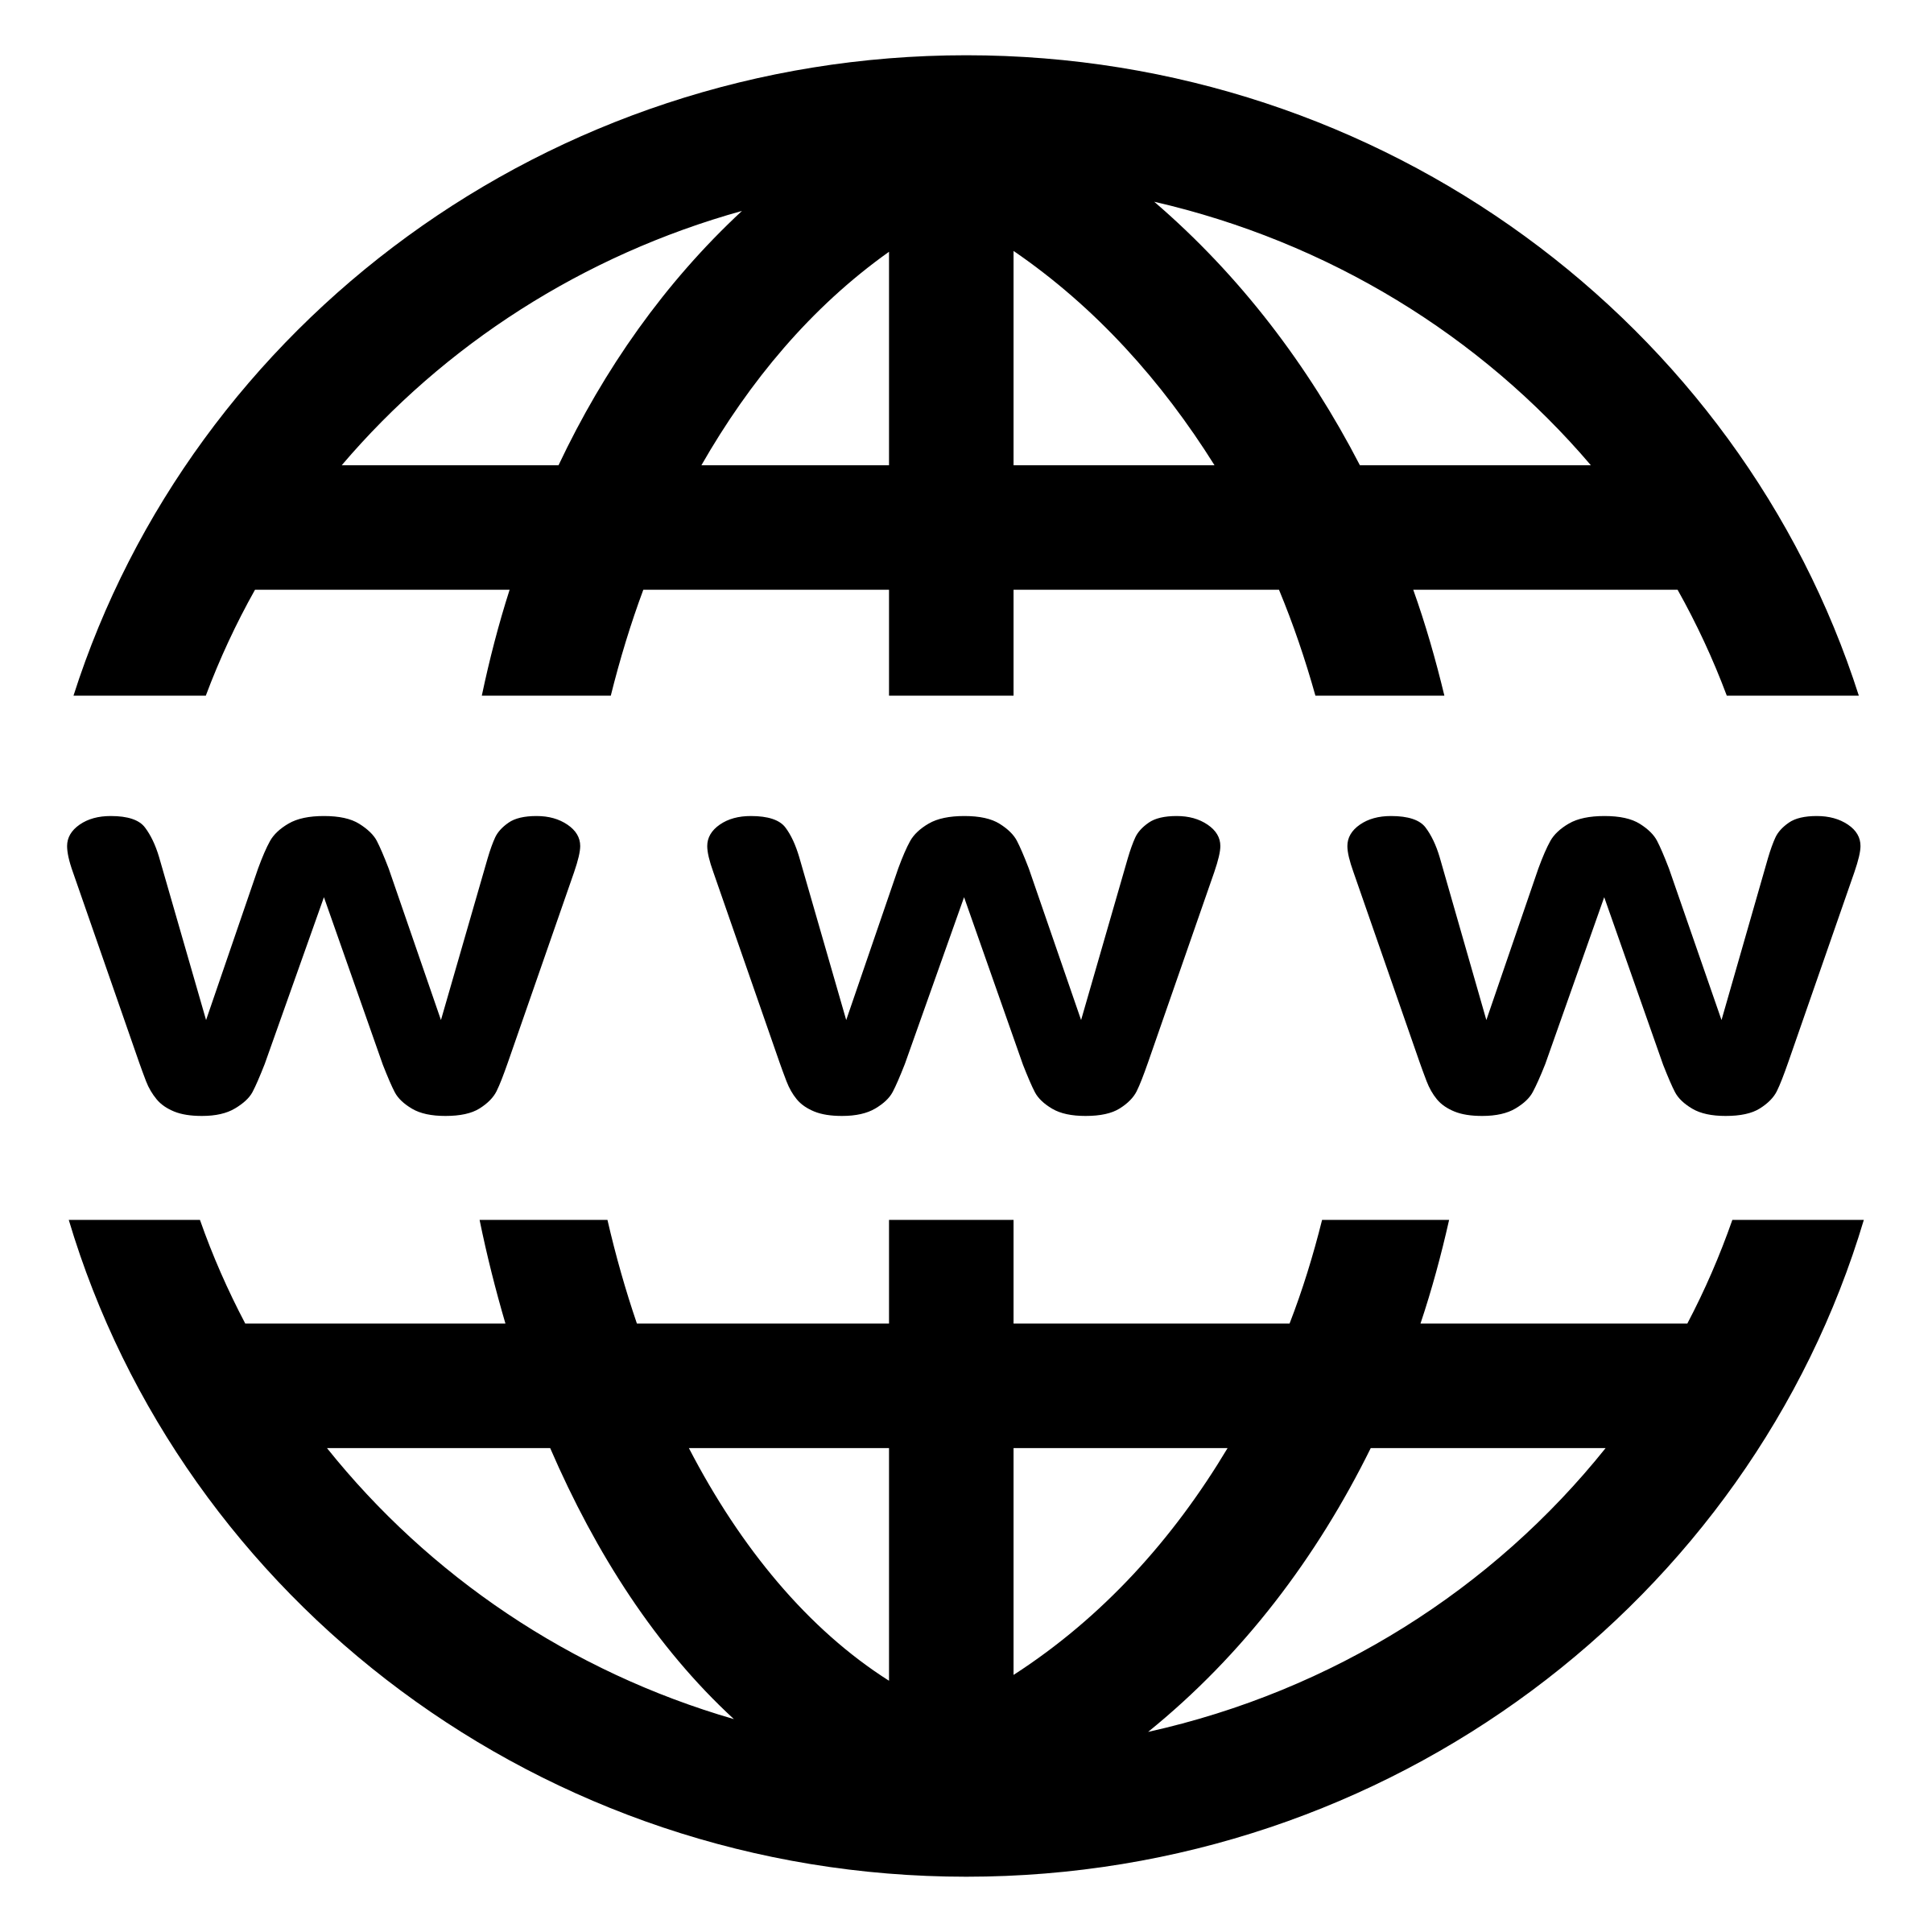 black-www-icon-17.png